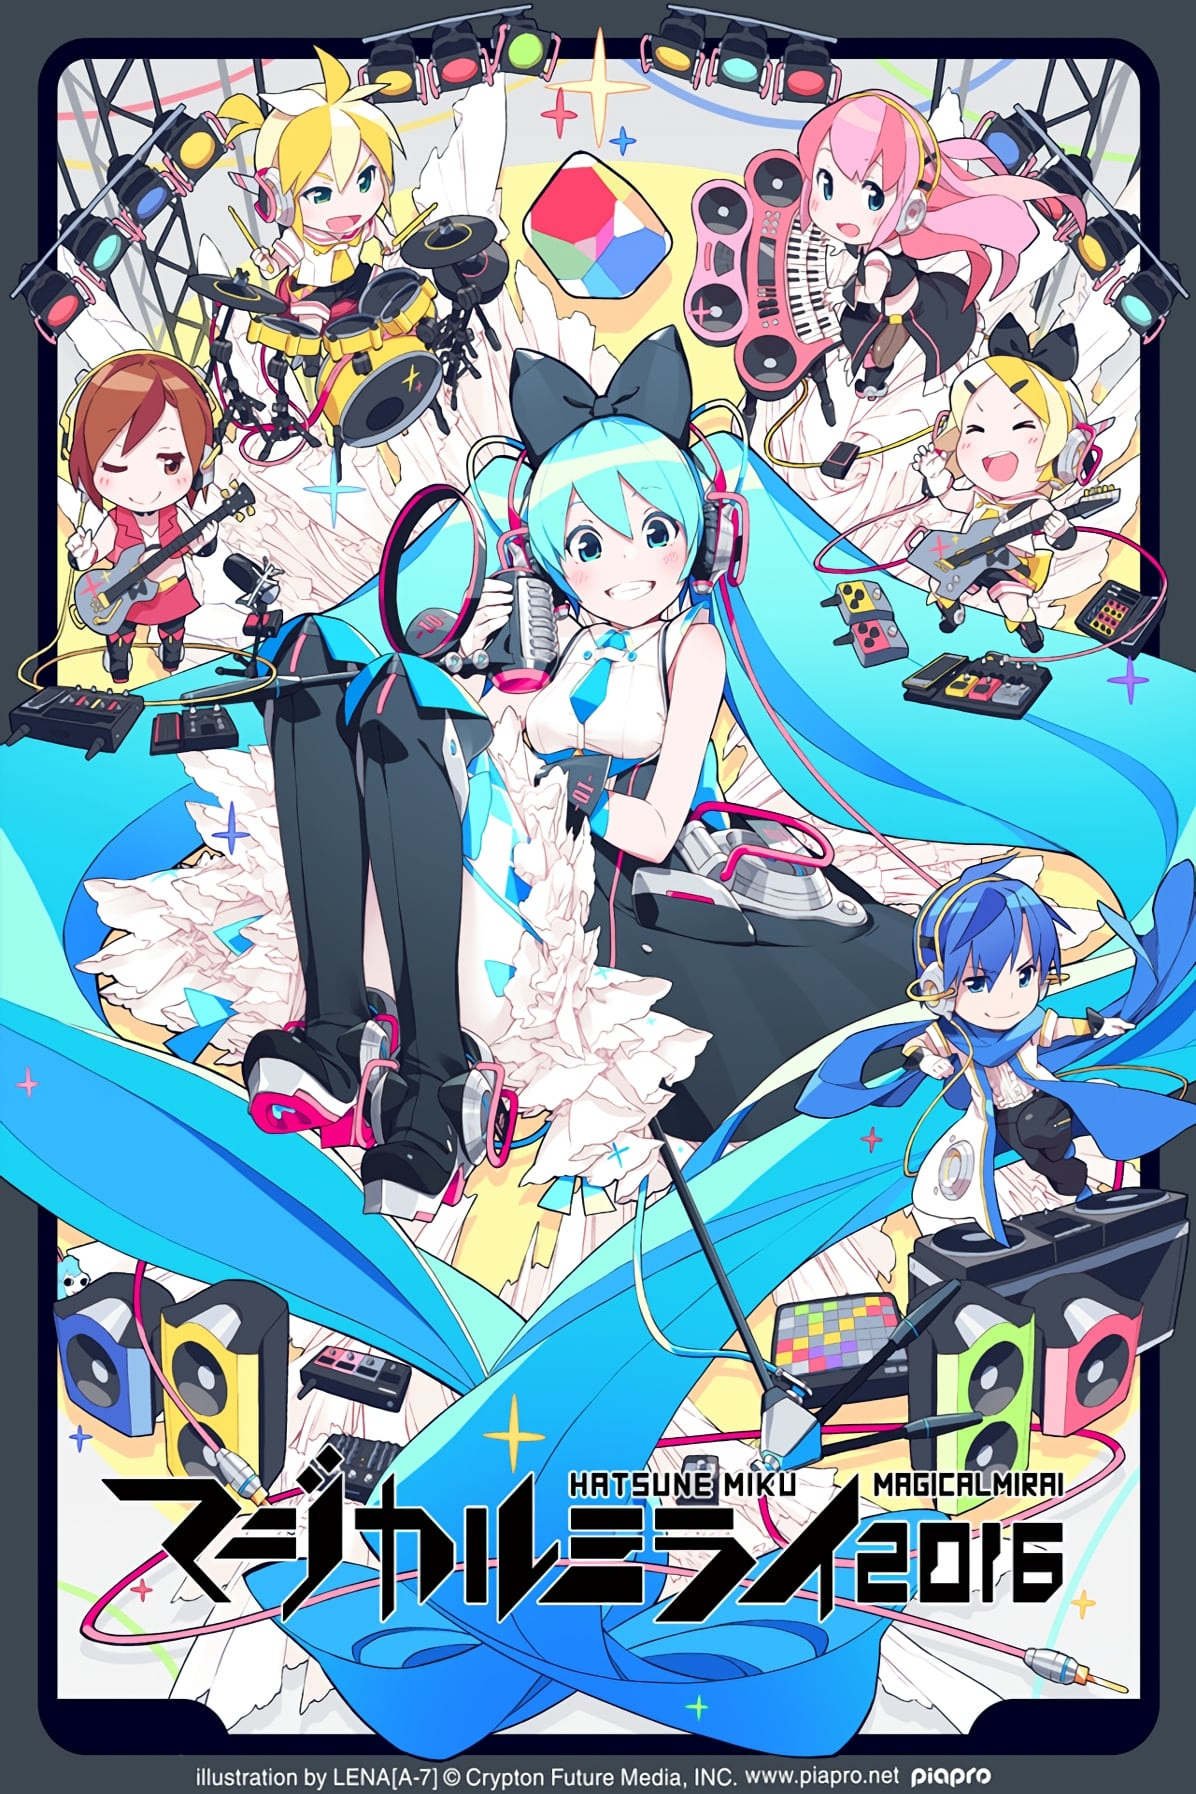 Hatsune Miku: Magical Mirai 2016 (2016)